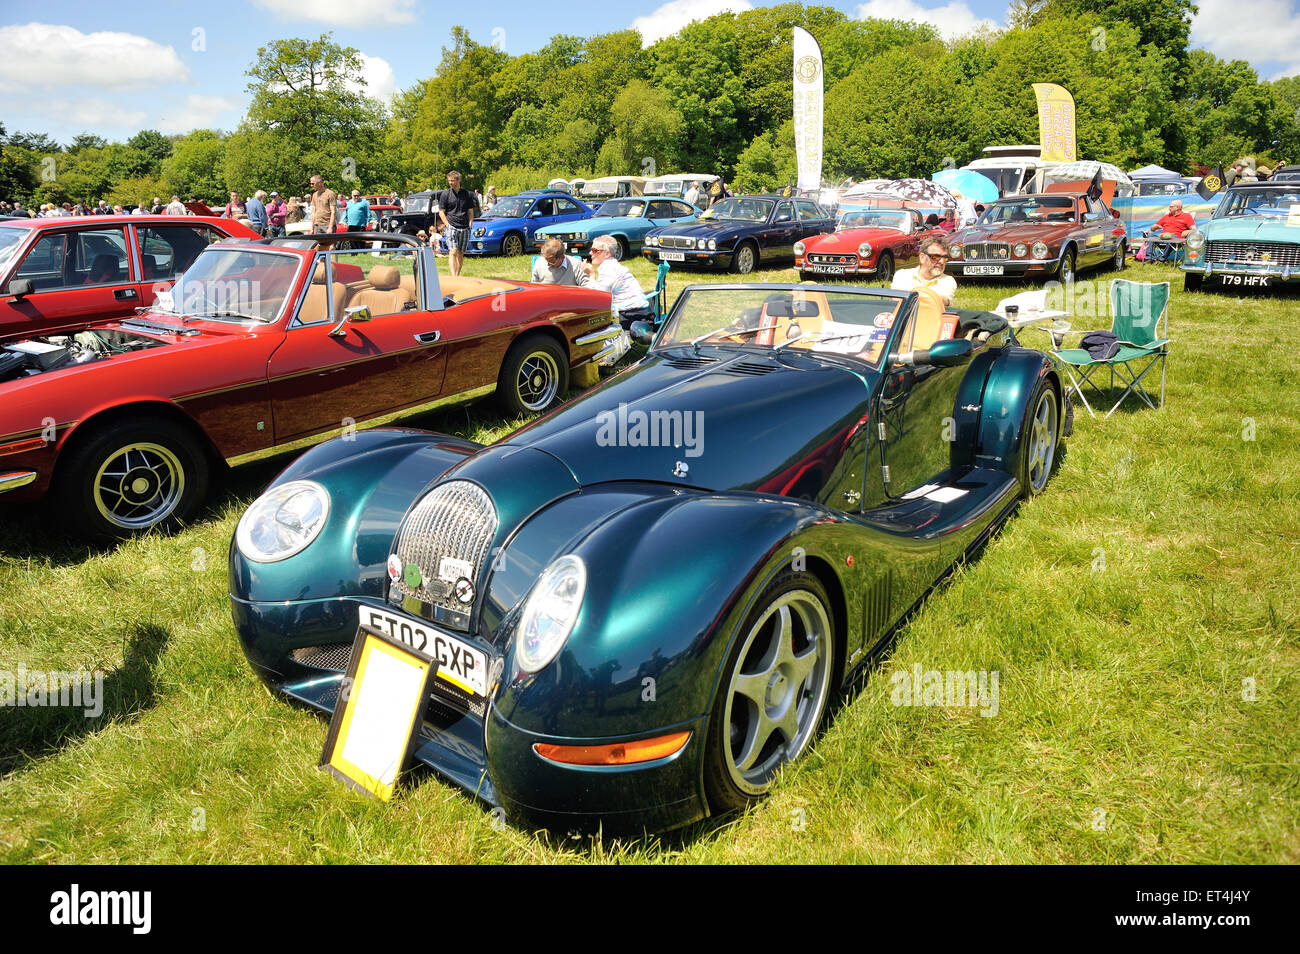 Classic Car Show Stock Photos & Classic Car Show Stock Images - Alamy